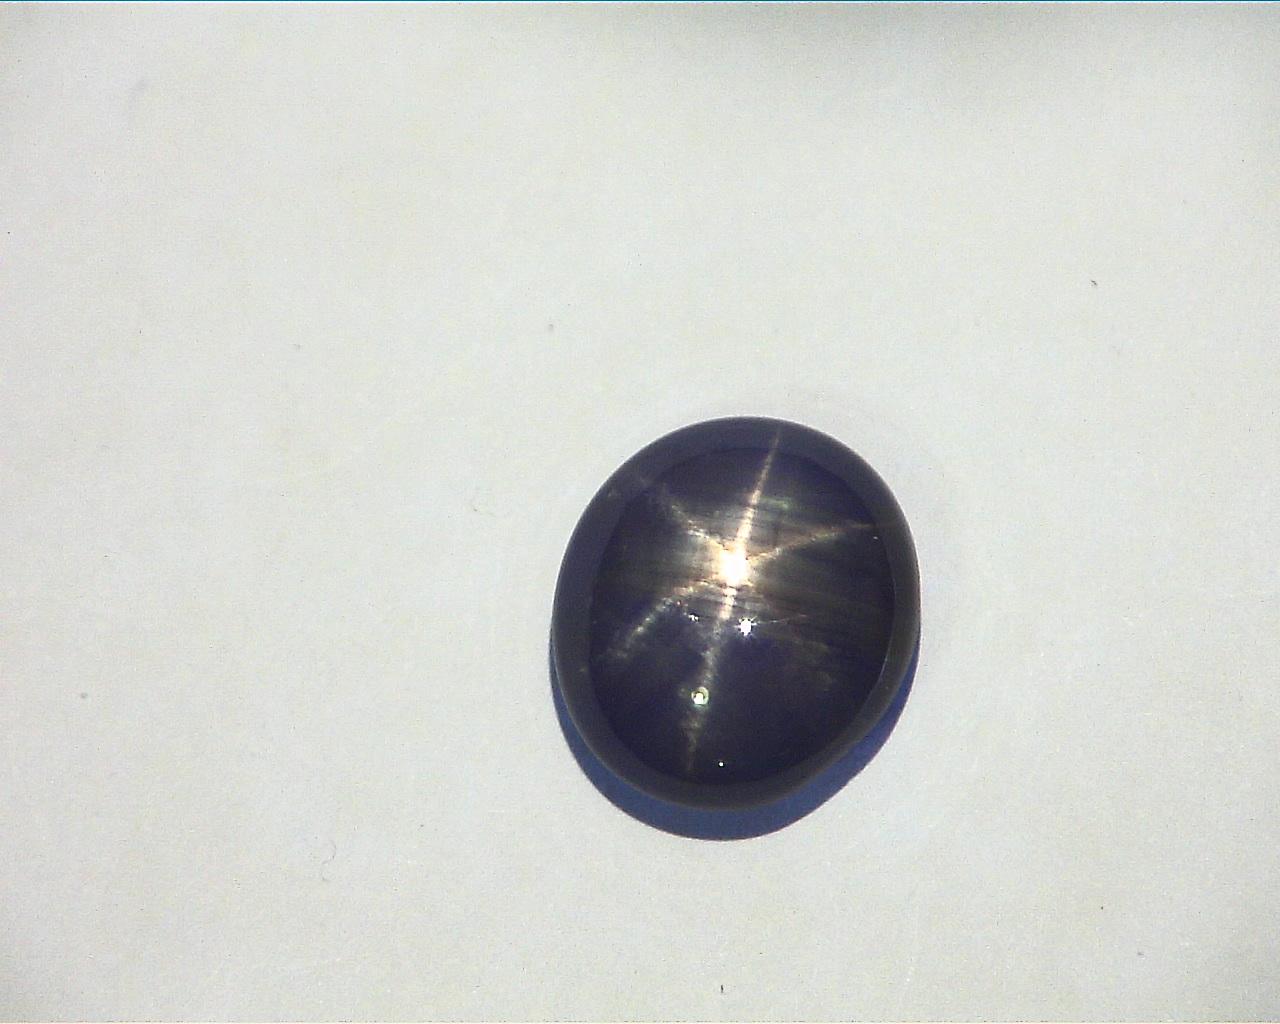 Blue Star Sapphire natural Genuine Gemstone GPG,755